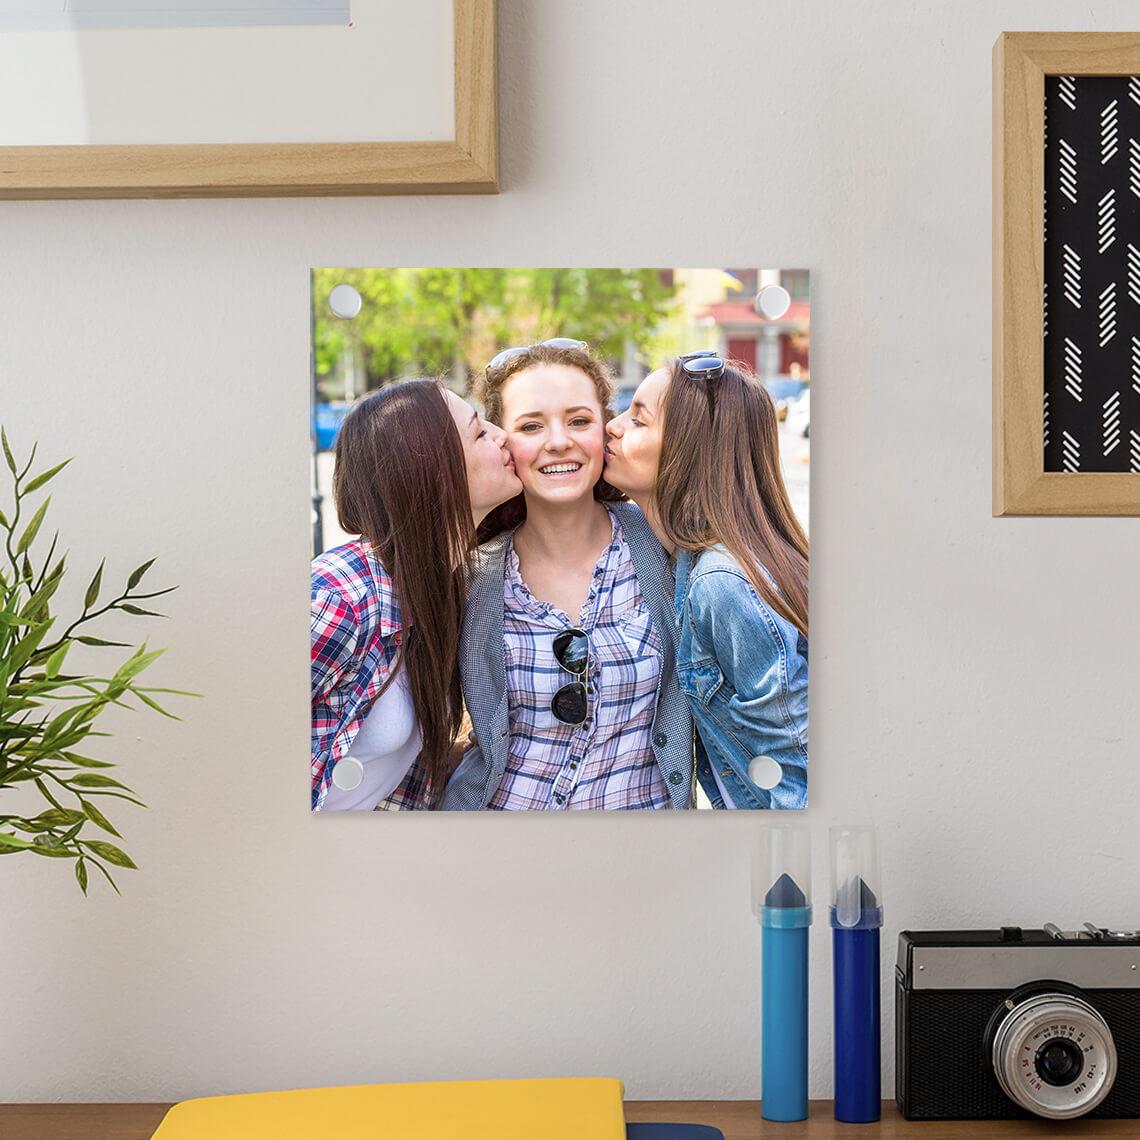 10x8 (25x20cm) Acrylic Photo Panel